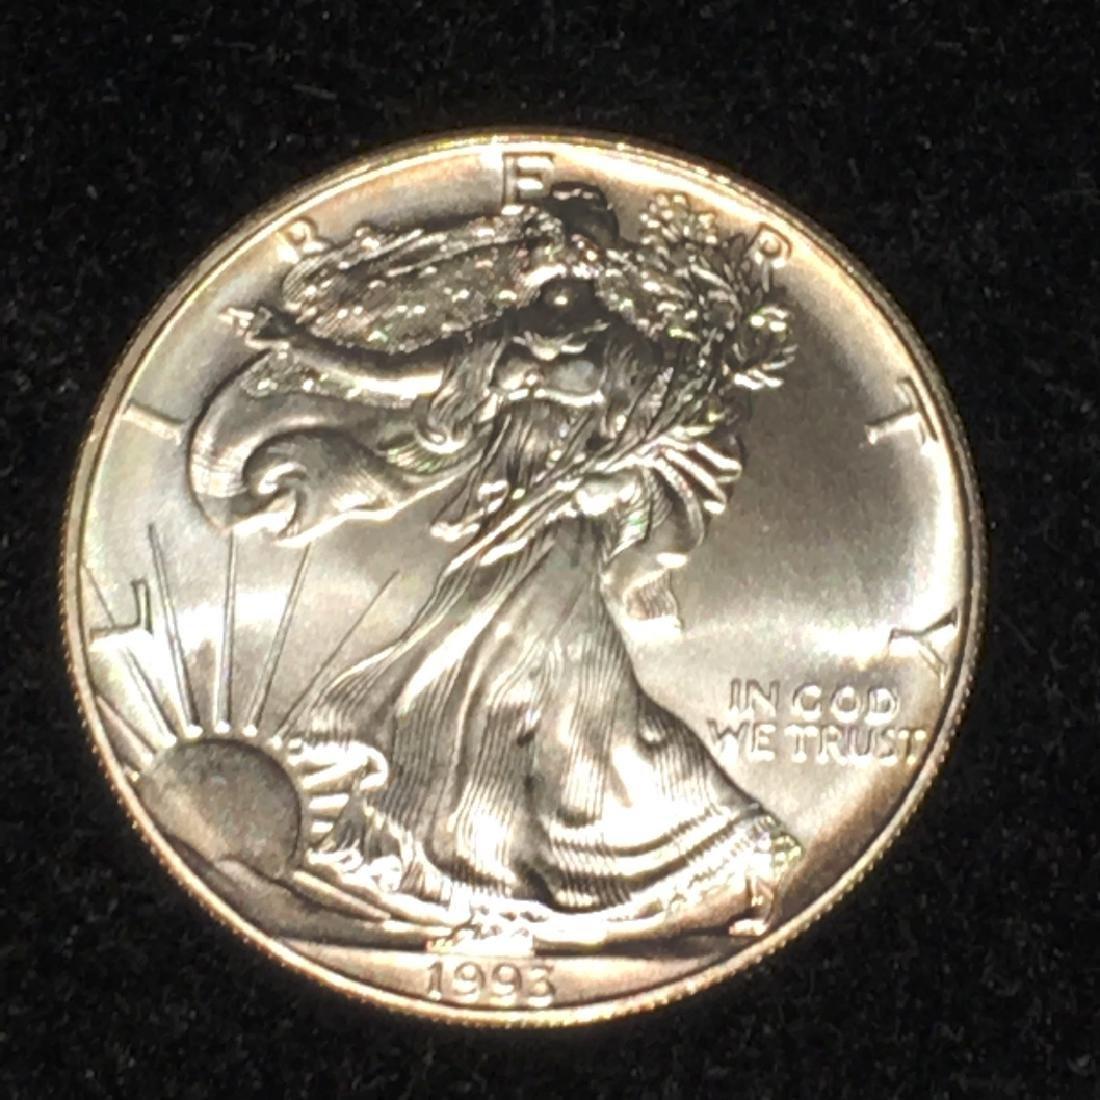 1993 SILVER EAGLE $1